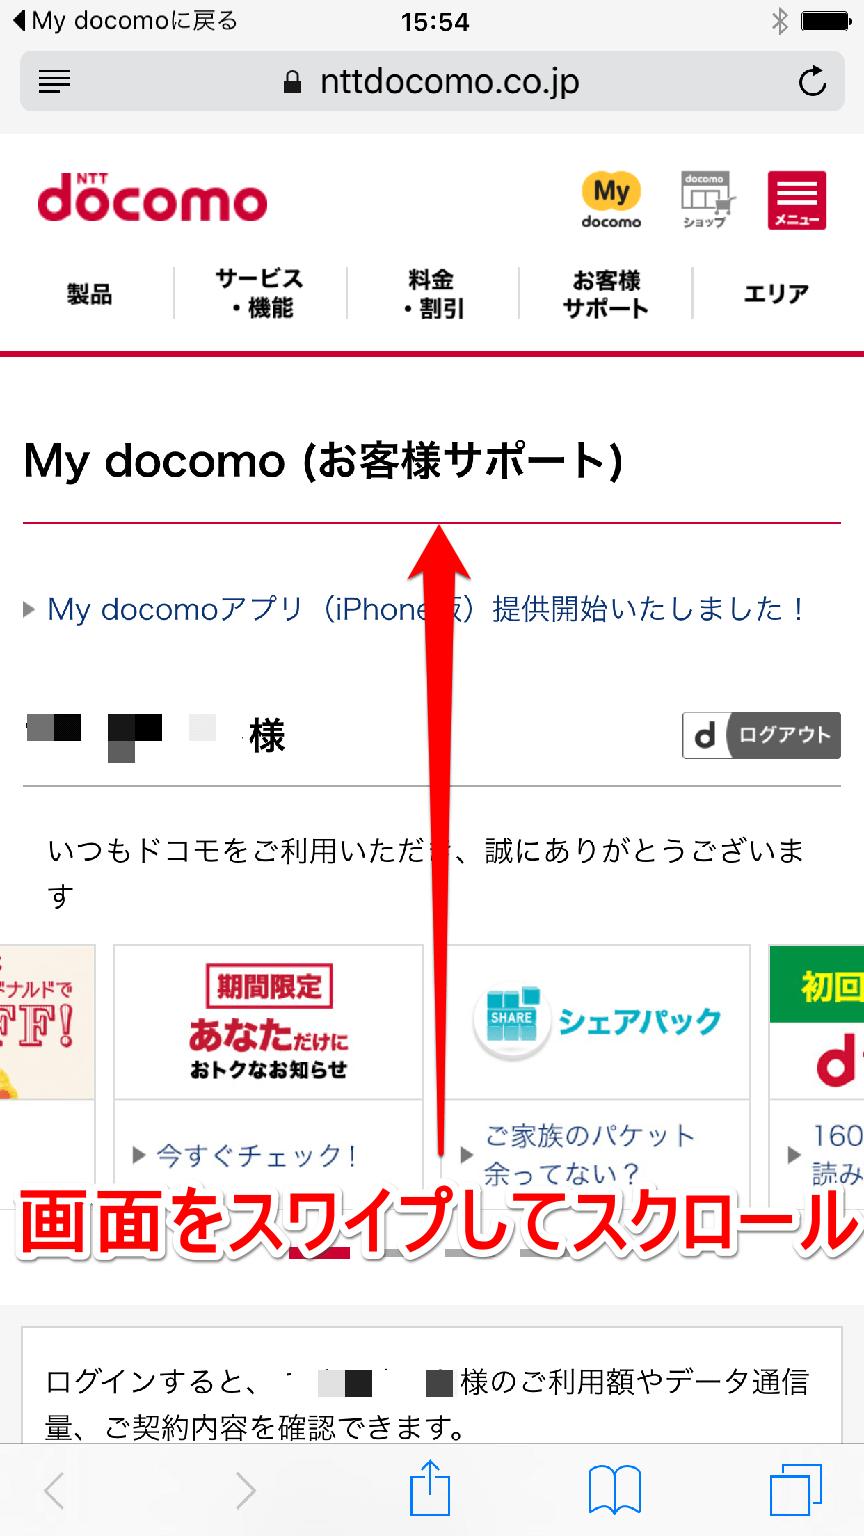 [My docomo(お客様サポート)]画面